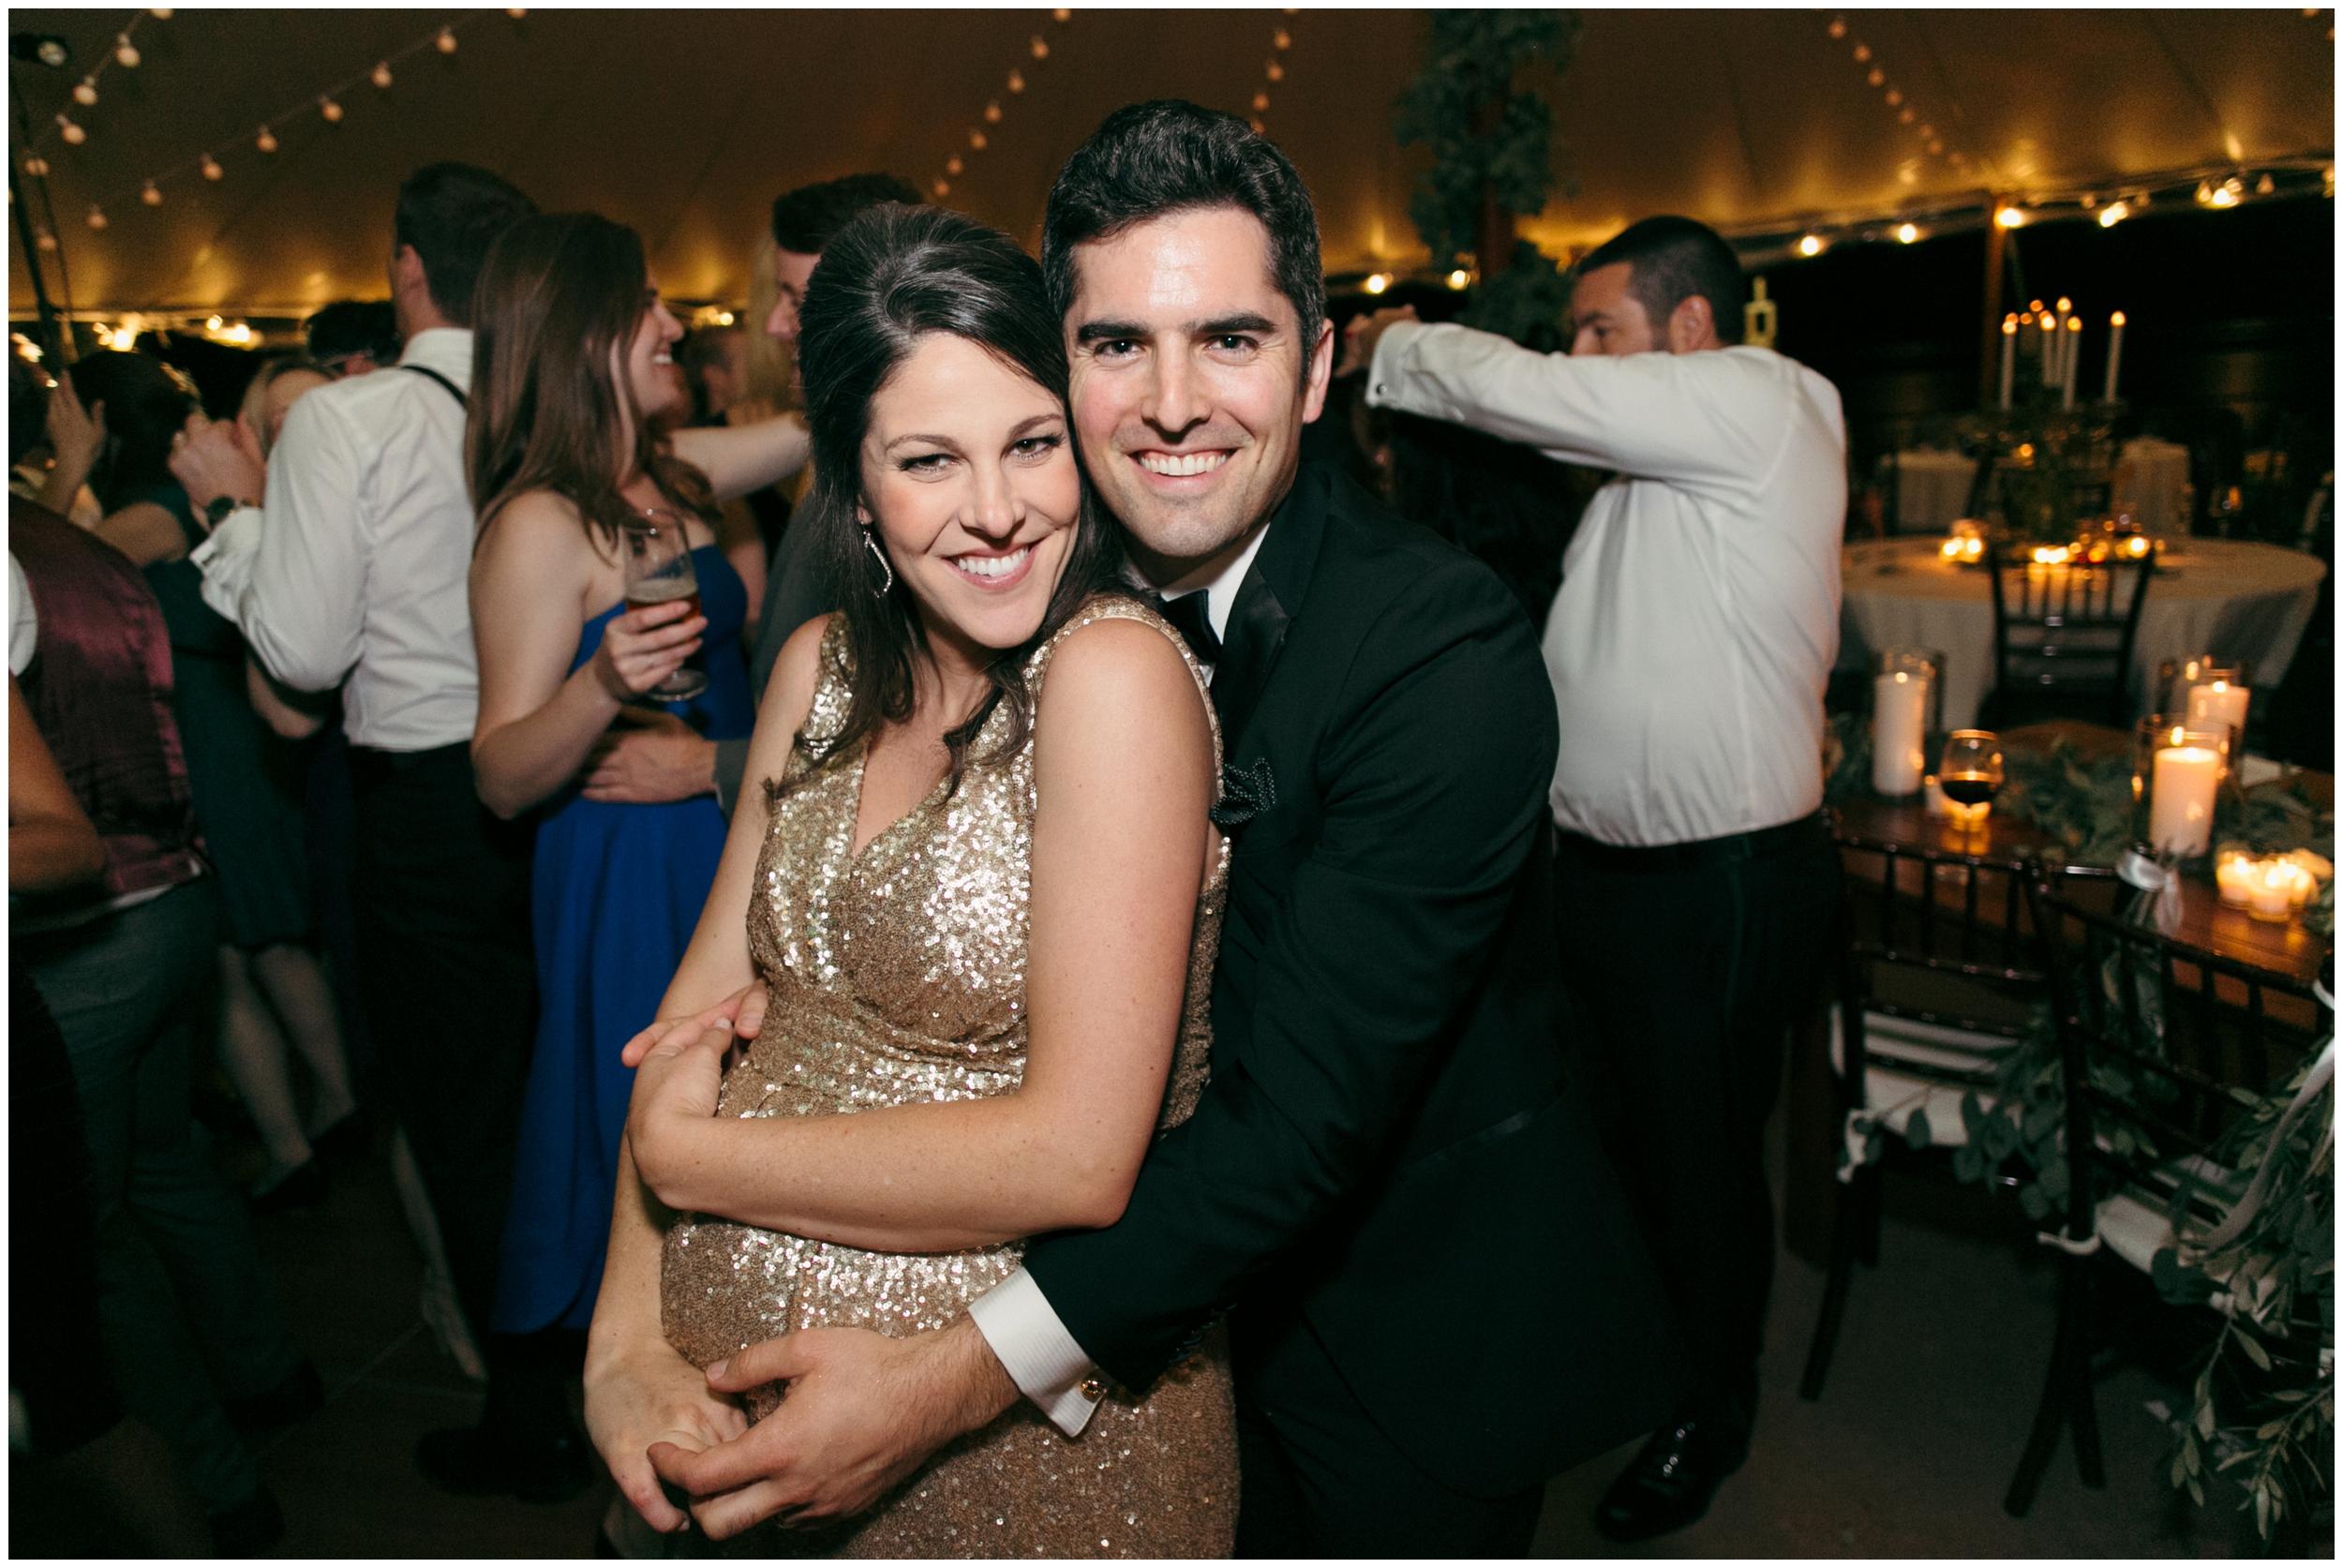 Willowdale-Estate-Wedding-Bailey-Q-Photo-Boston-Wedding-Photographer-104.JPG